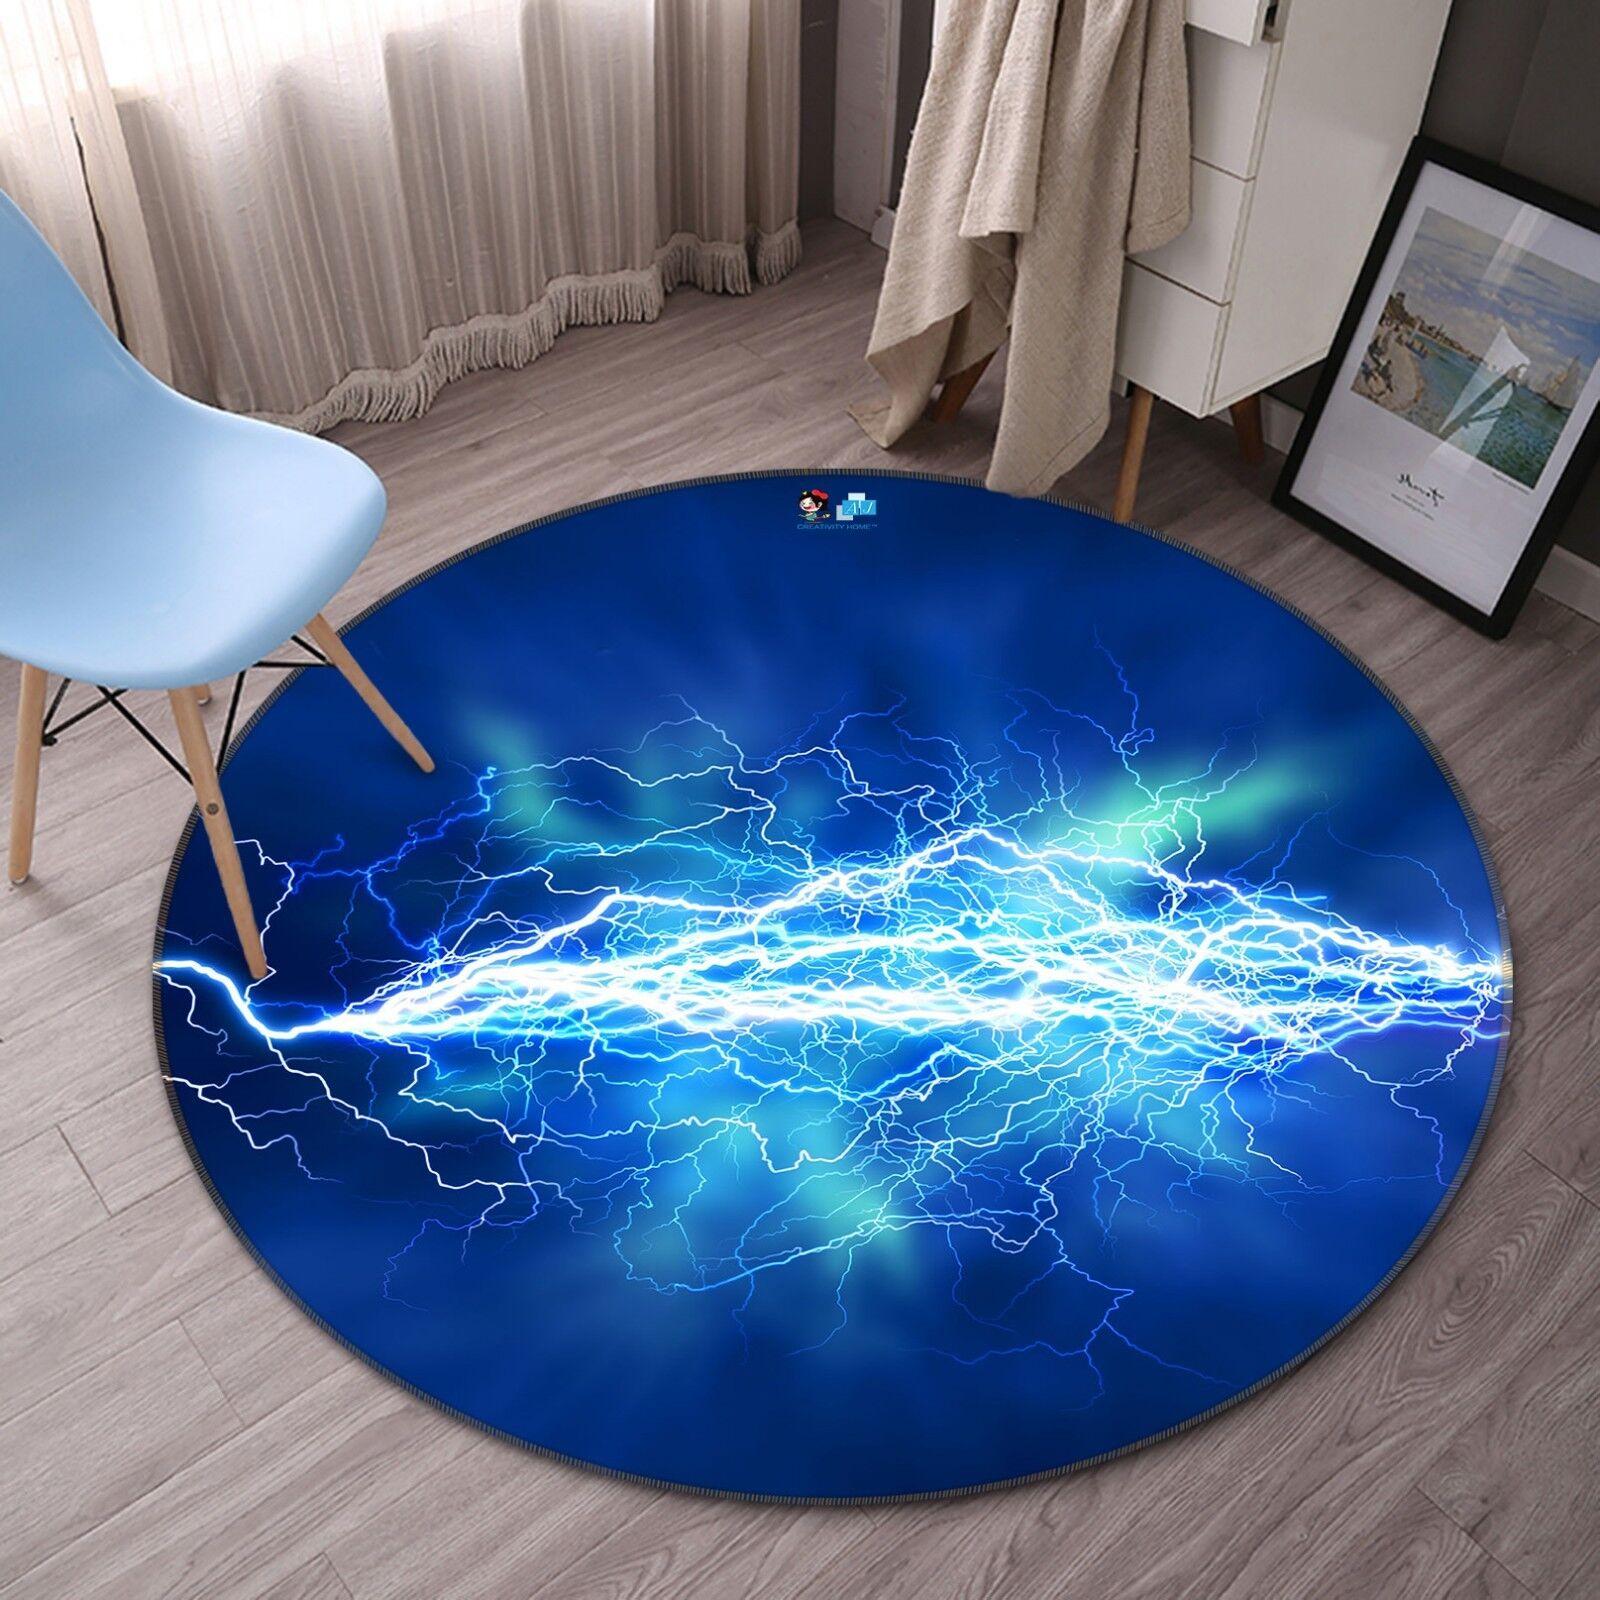 3D Lightning 588 tappetino antiscivolo tappeto camera Tappetino Tondo Qualità Elegante foto Tappeto UK